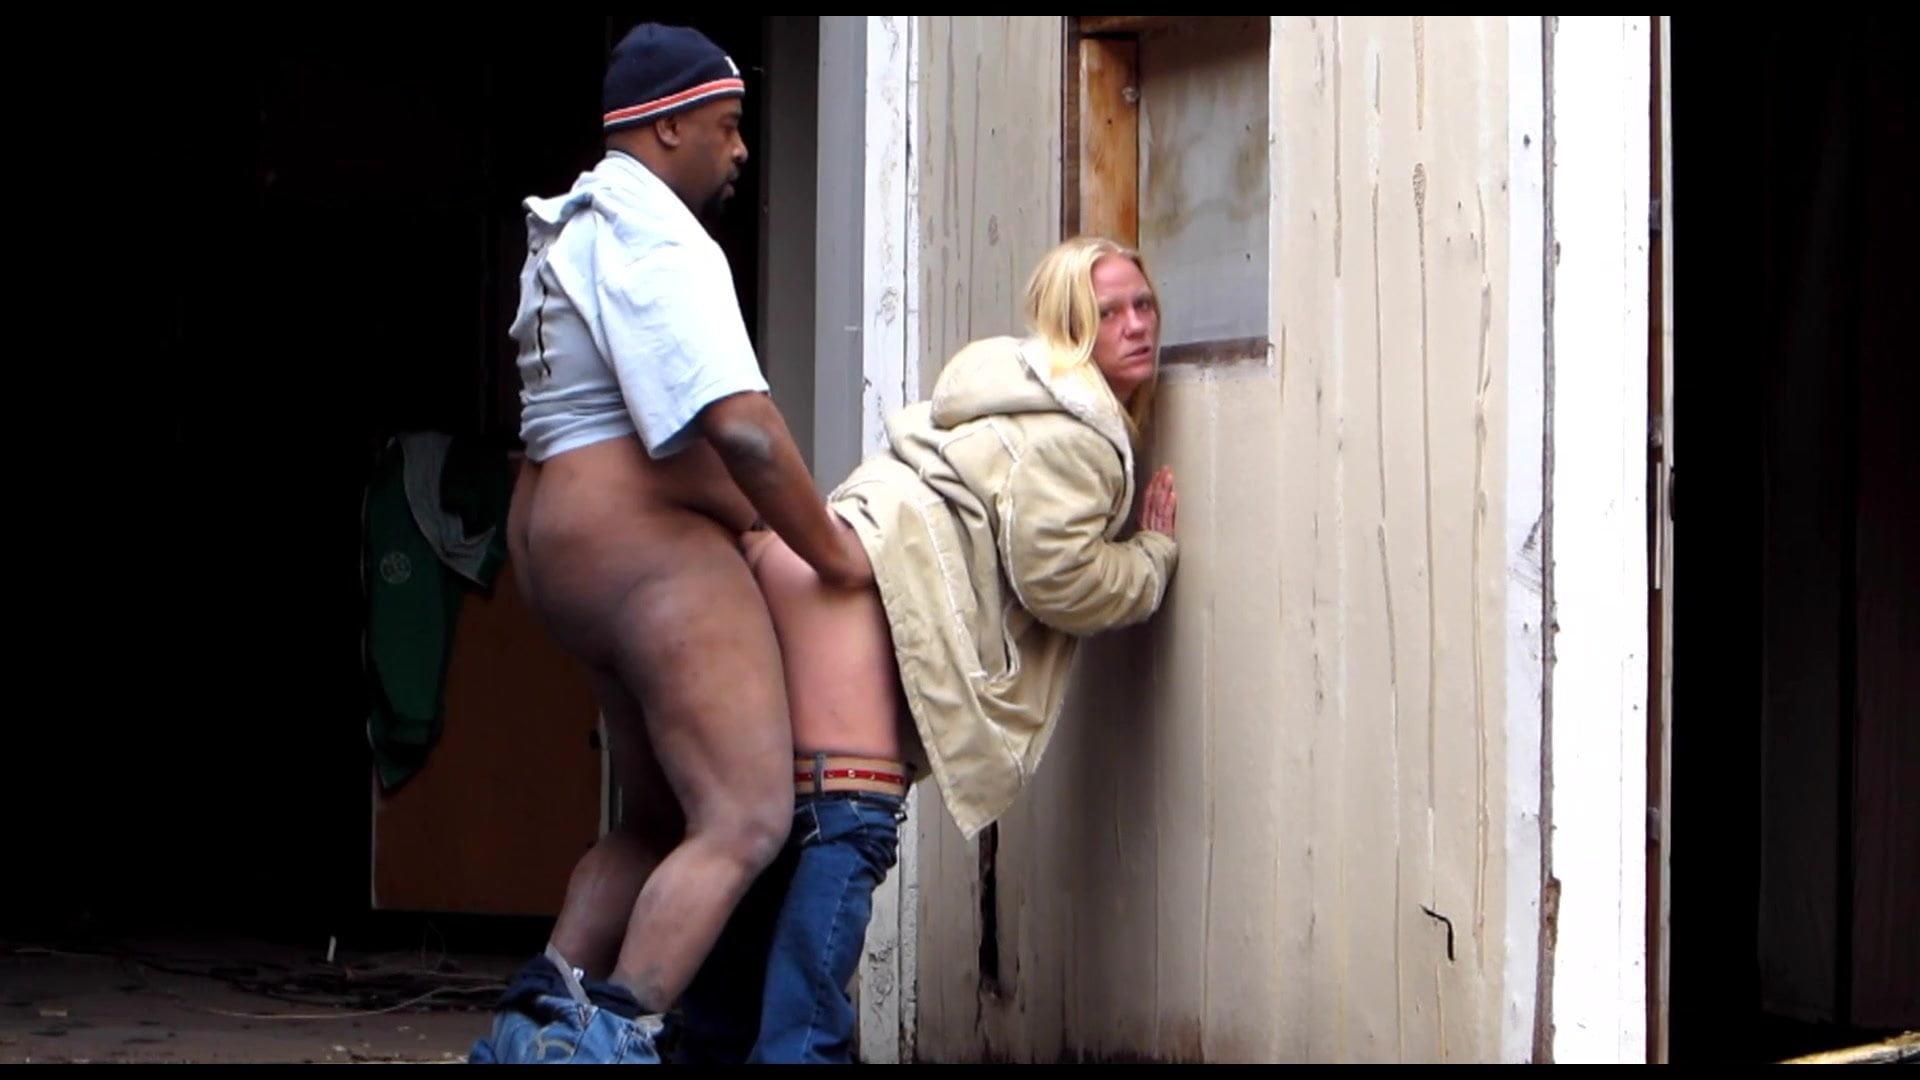 Street Prostitute Sex